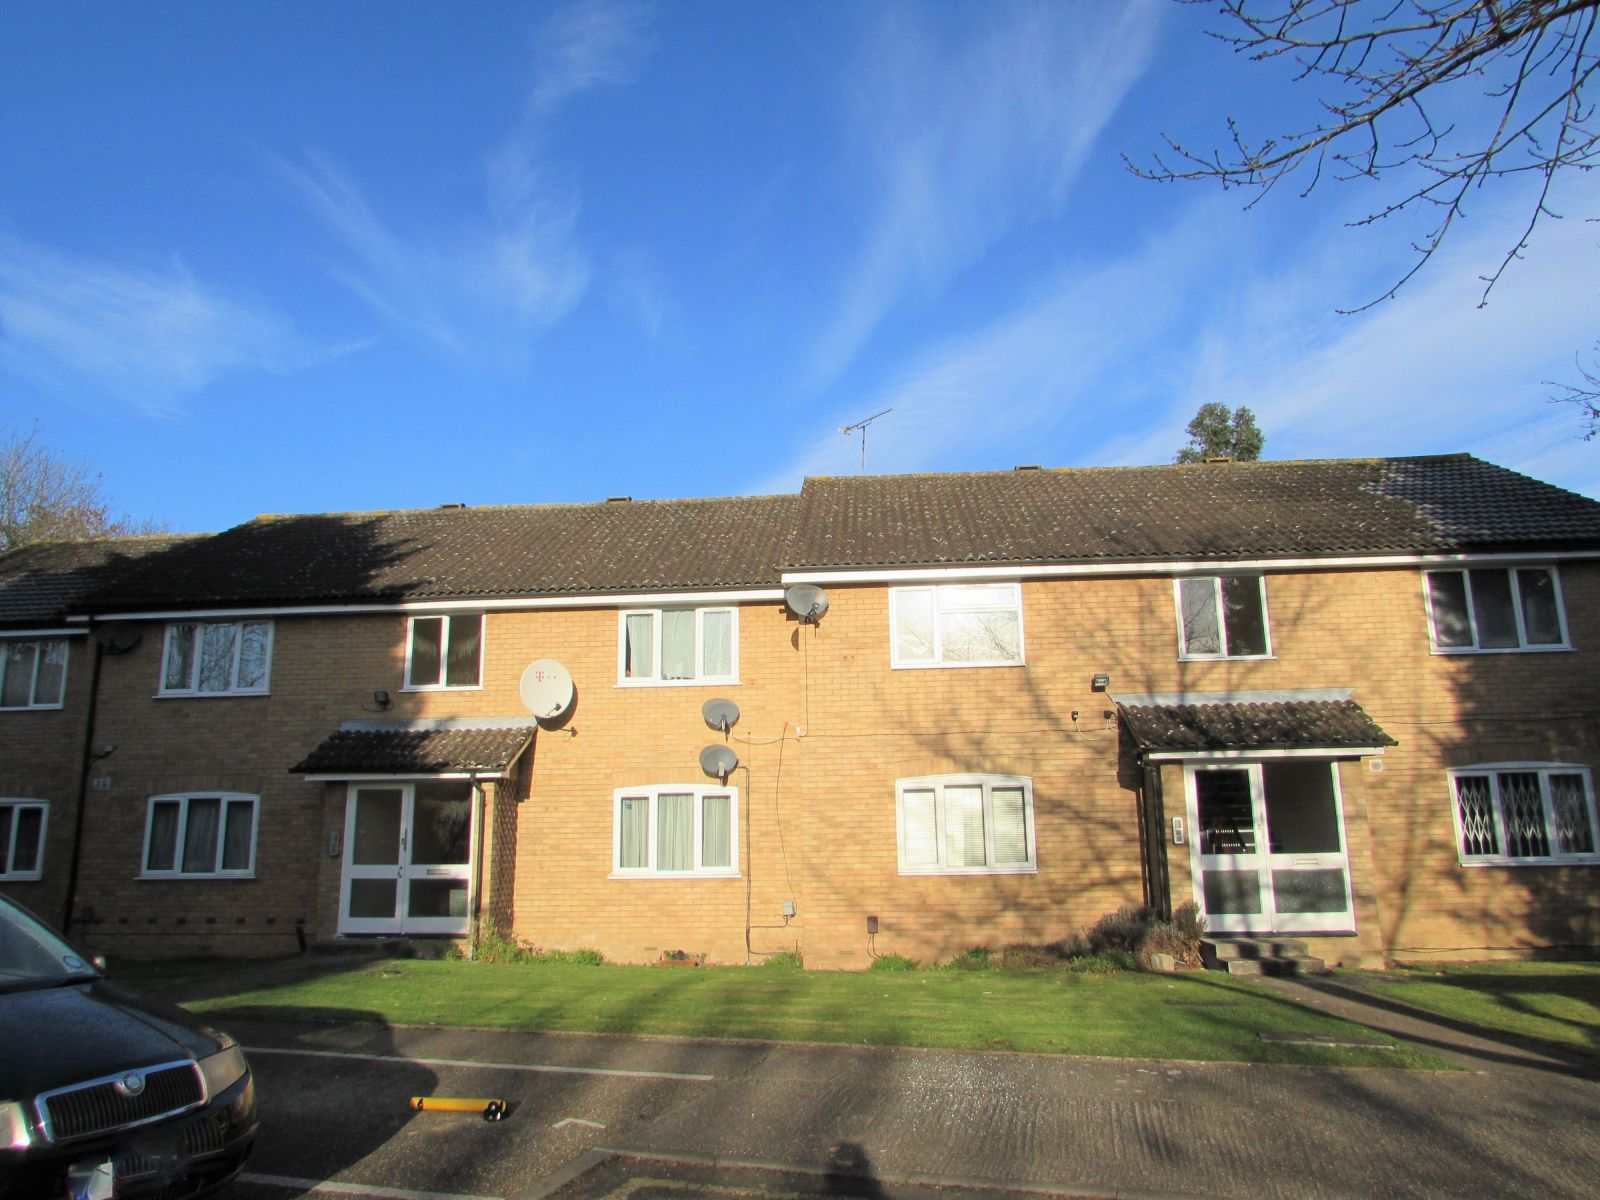 Property photo 1 of 5. Sarita Close, Harrow Weald, Middlesex Ha3